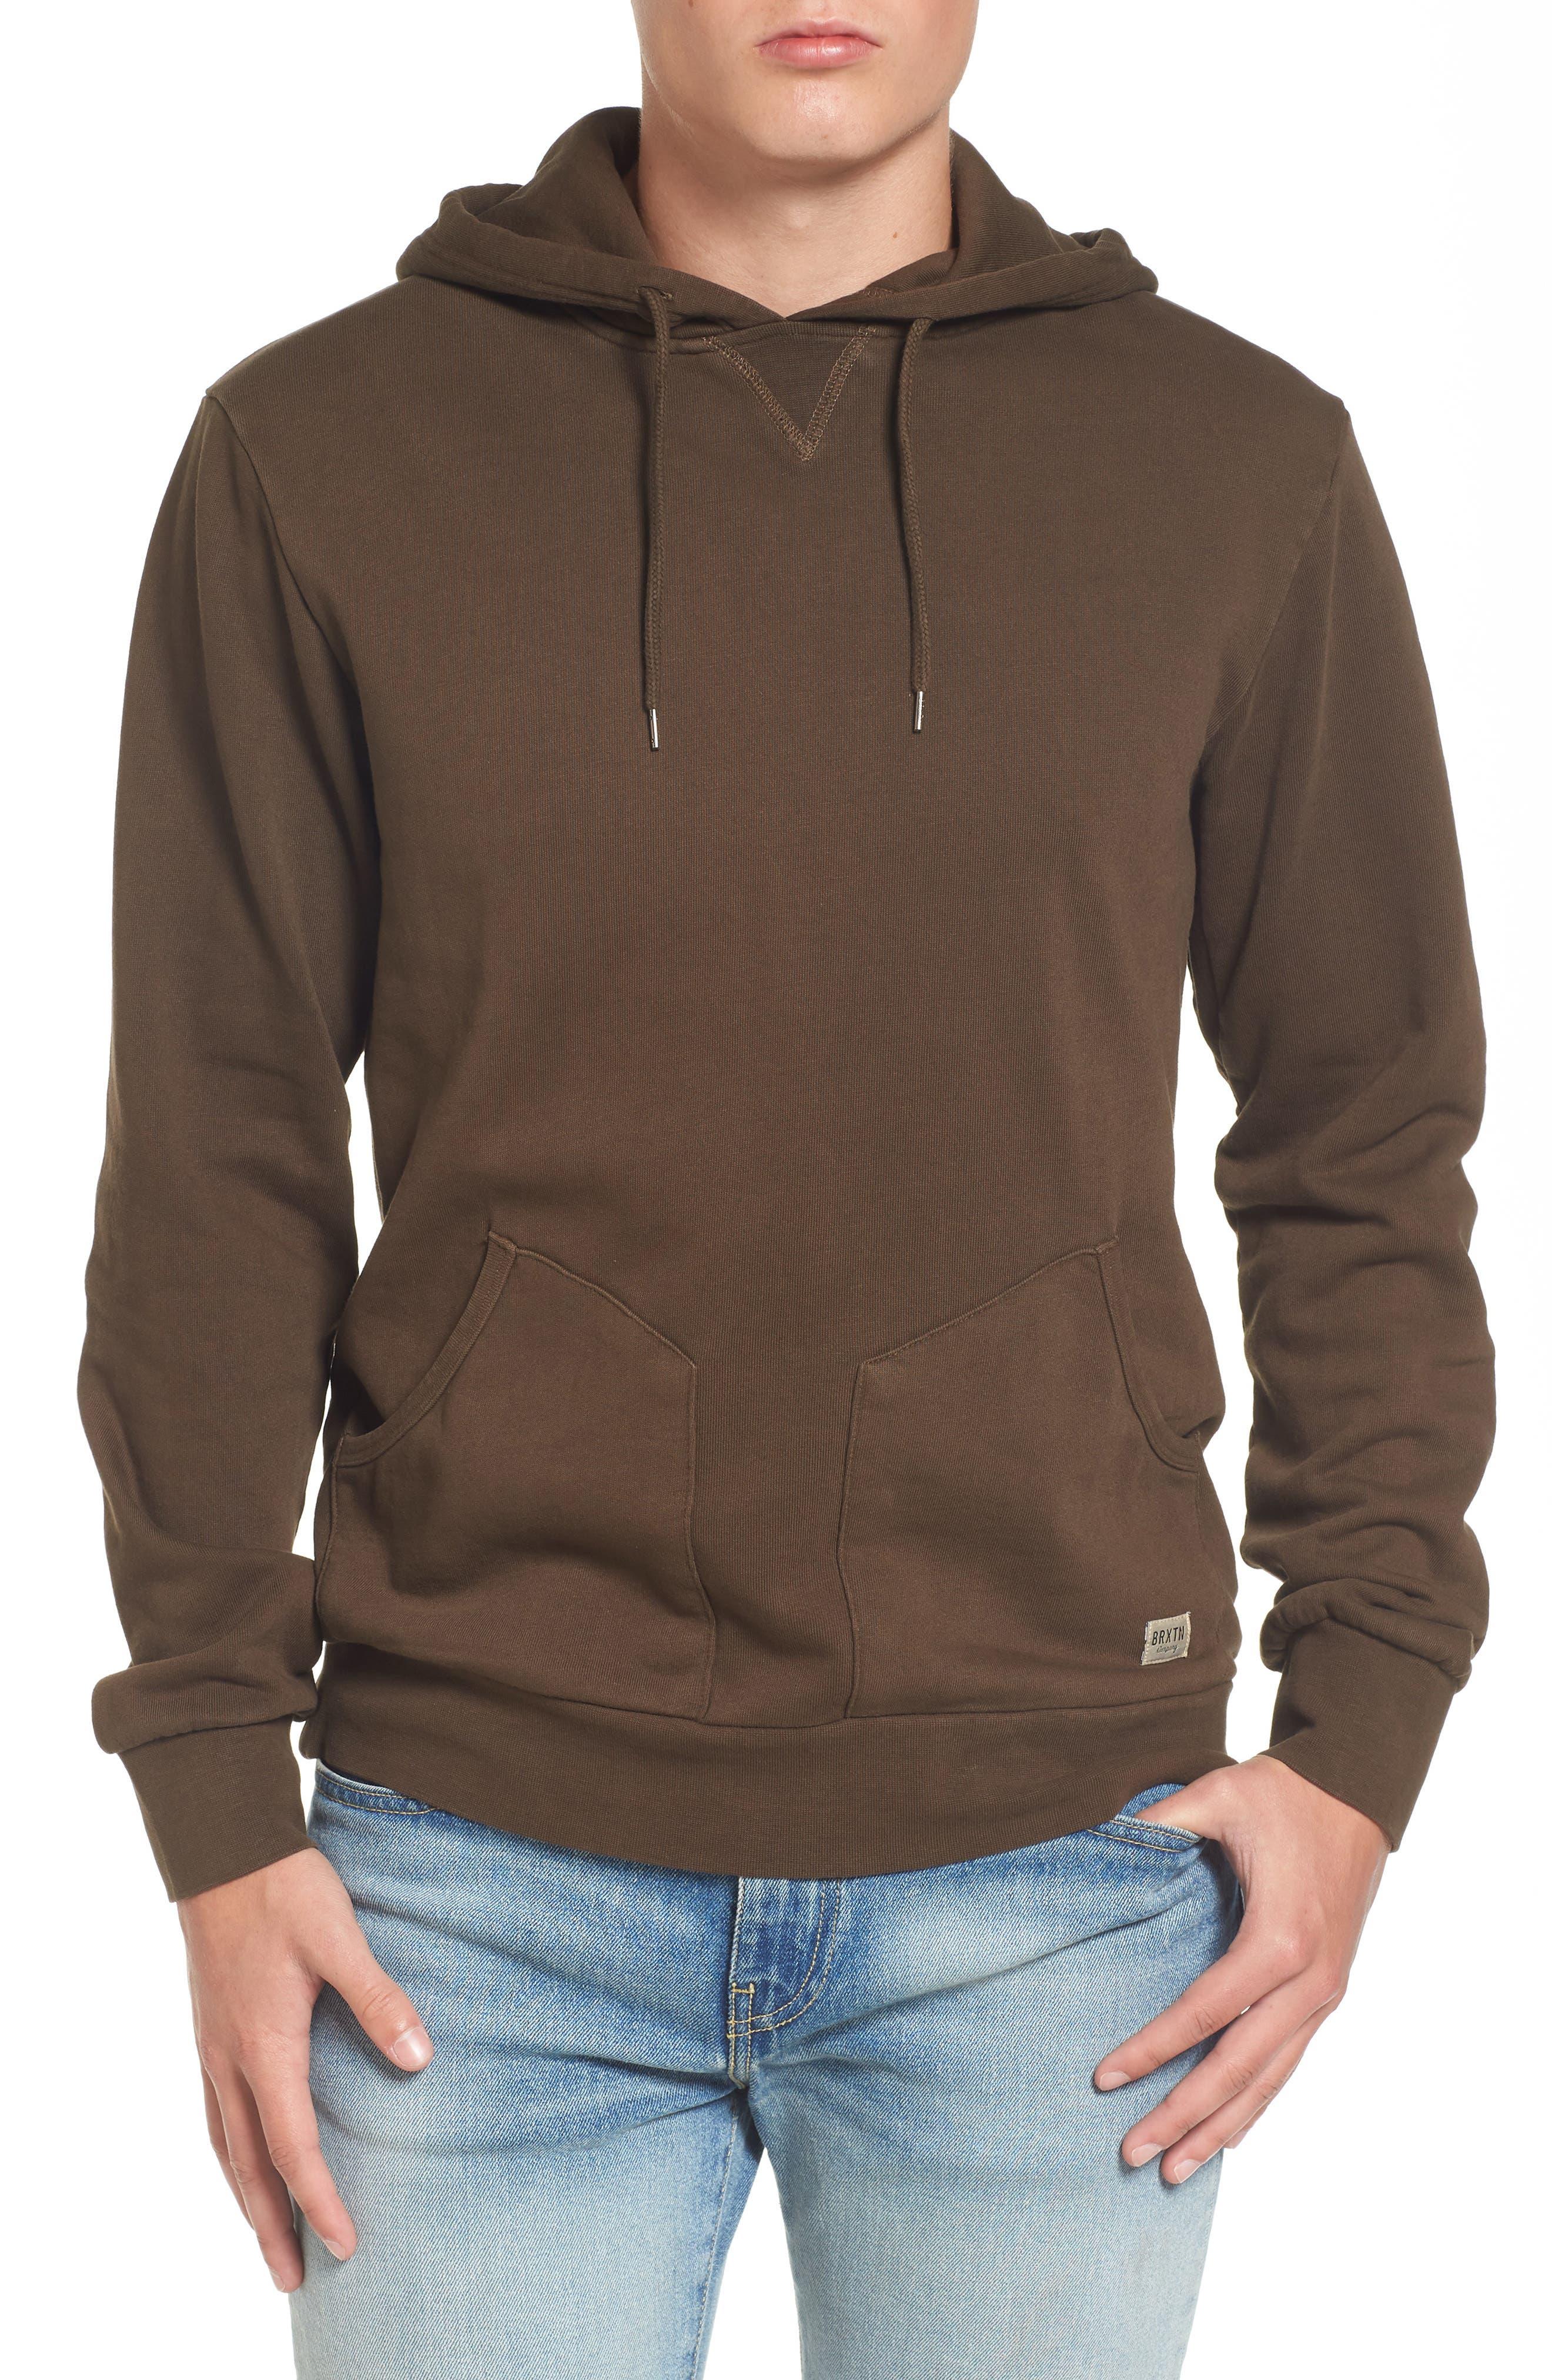 Hooded Fleece Sweatshirt,                         Main,                         color, 210